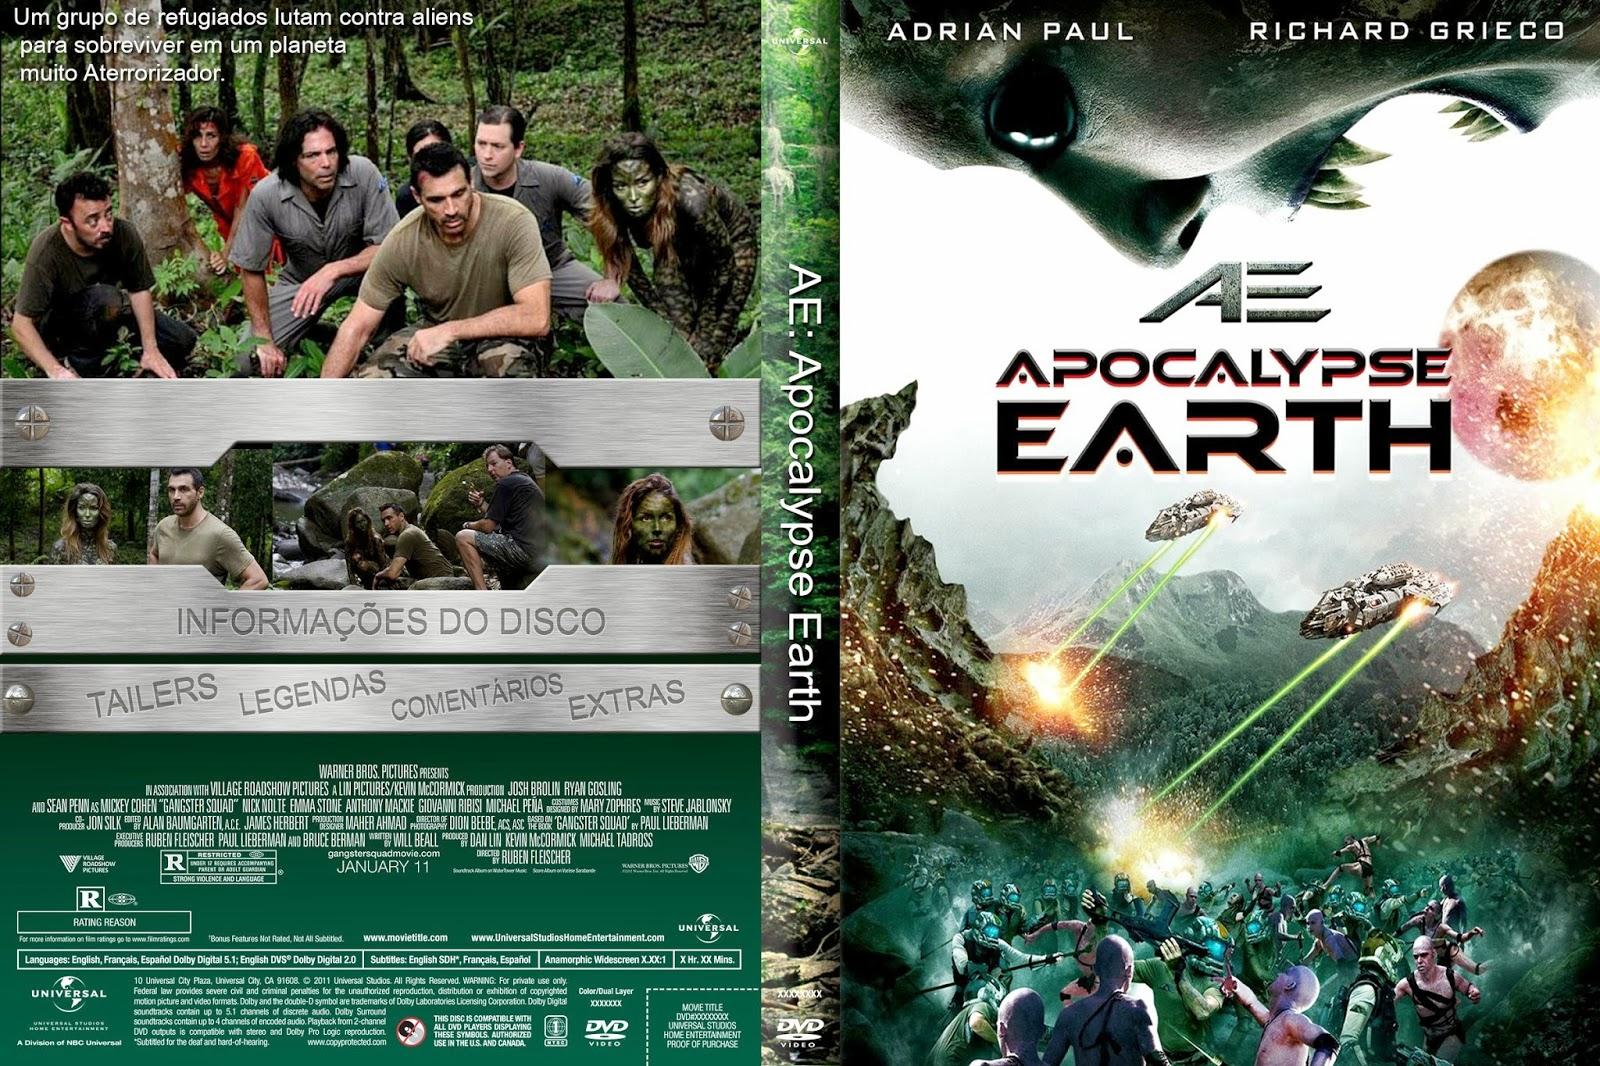 Apocalipse Final BDRip XviD Dual Áudio  5BShare Capas Fornari 5DAE  Apocalypse Earth